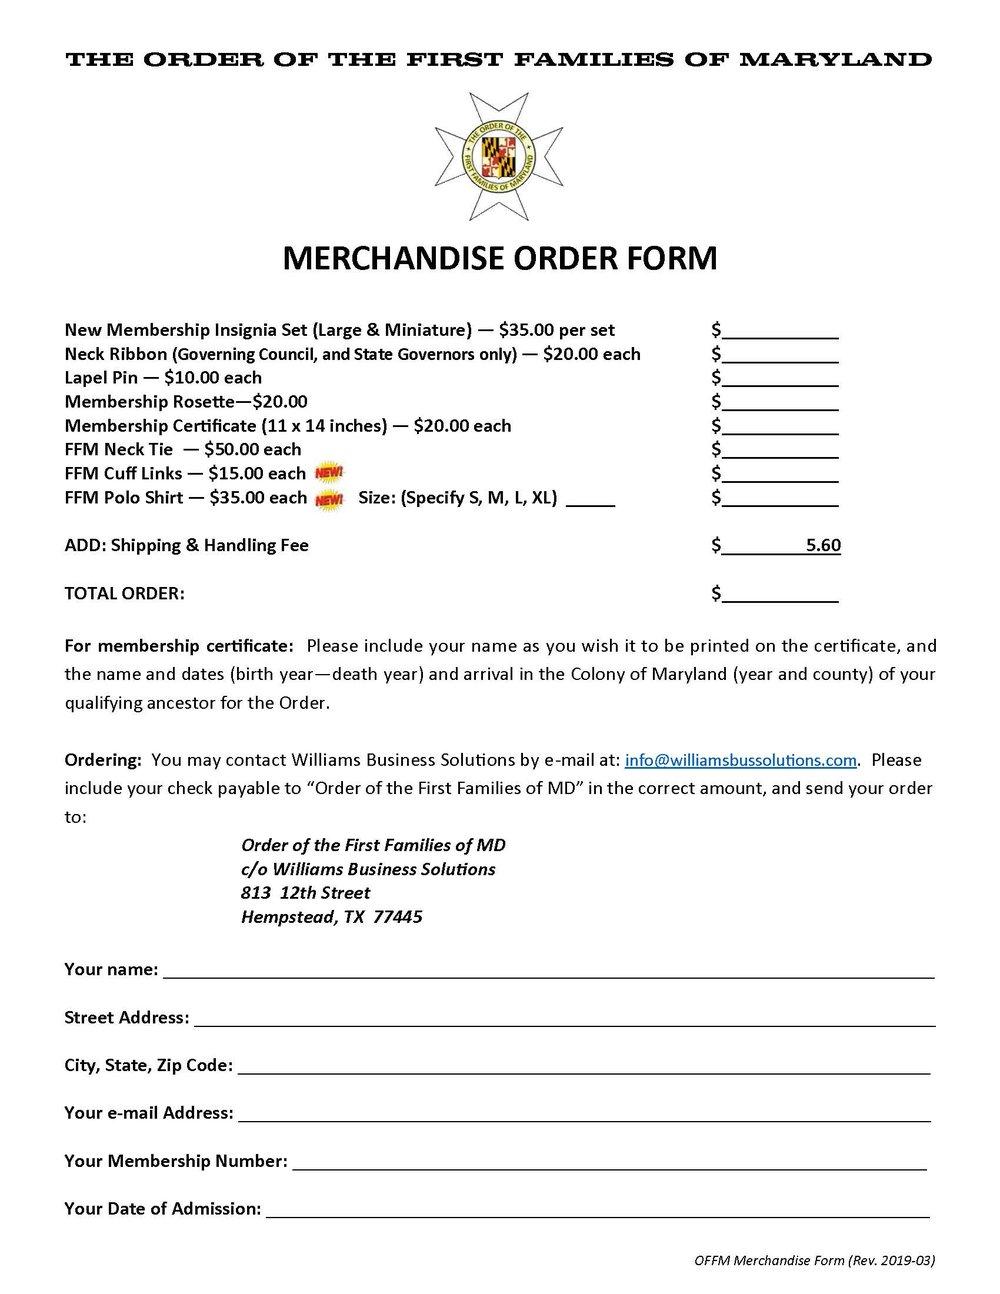 Merchandise Order Form (Rev. 2019-03)_Page_1.jpg